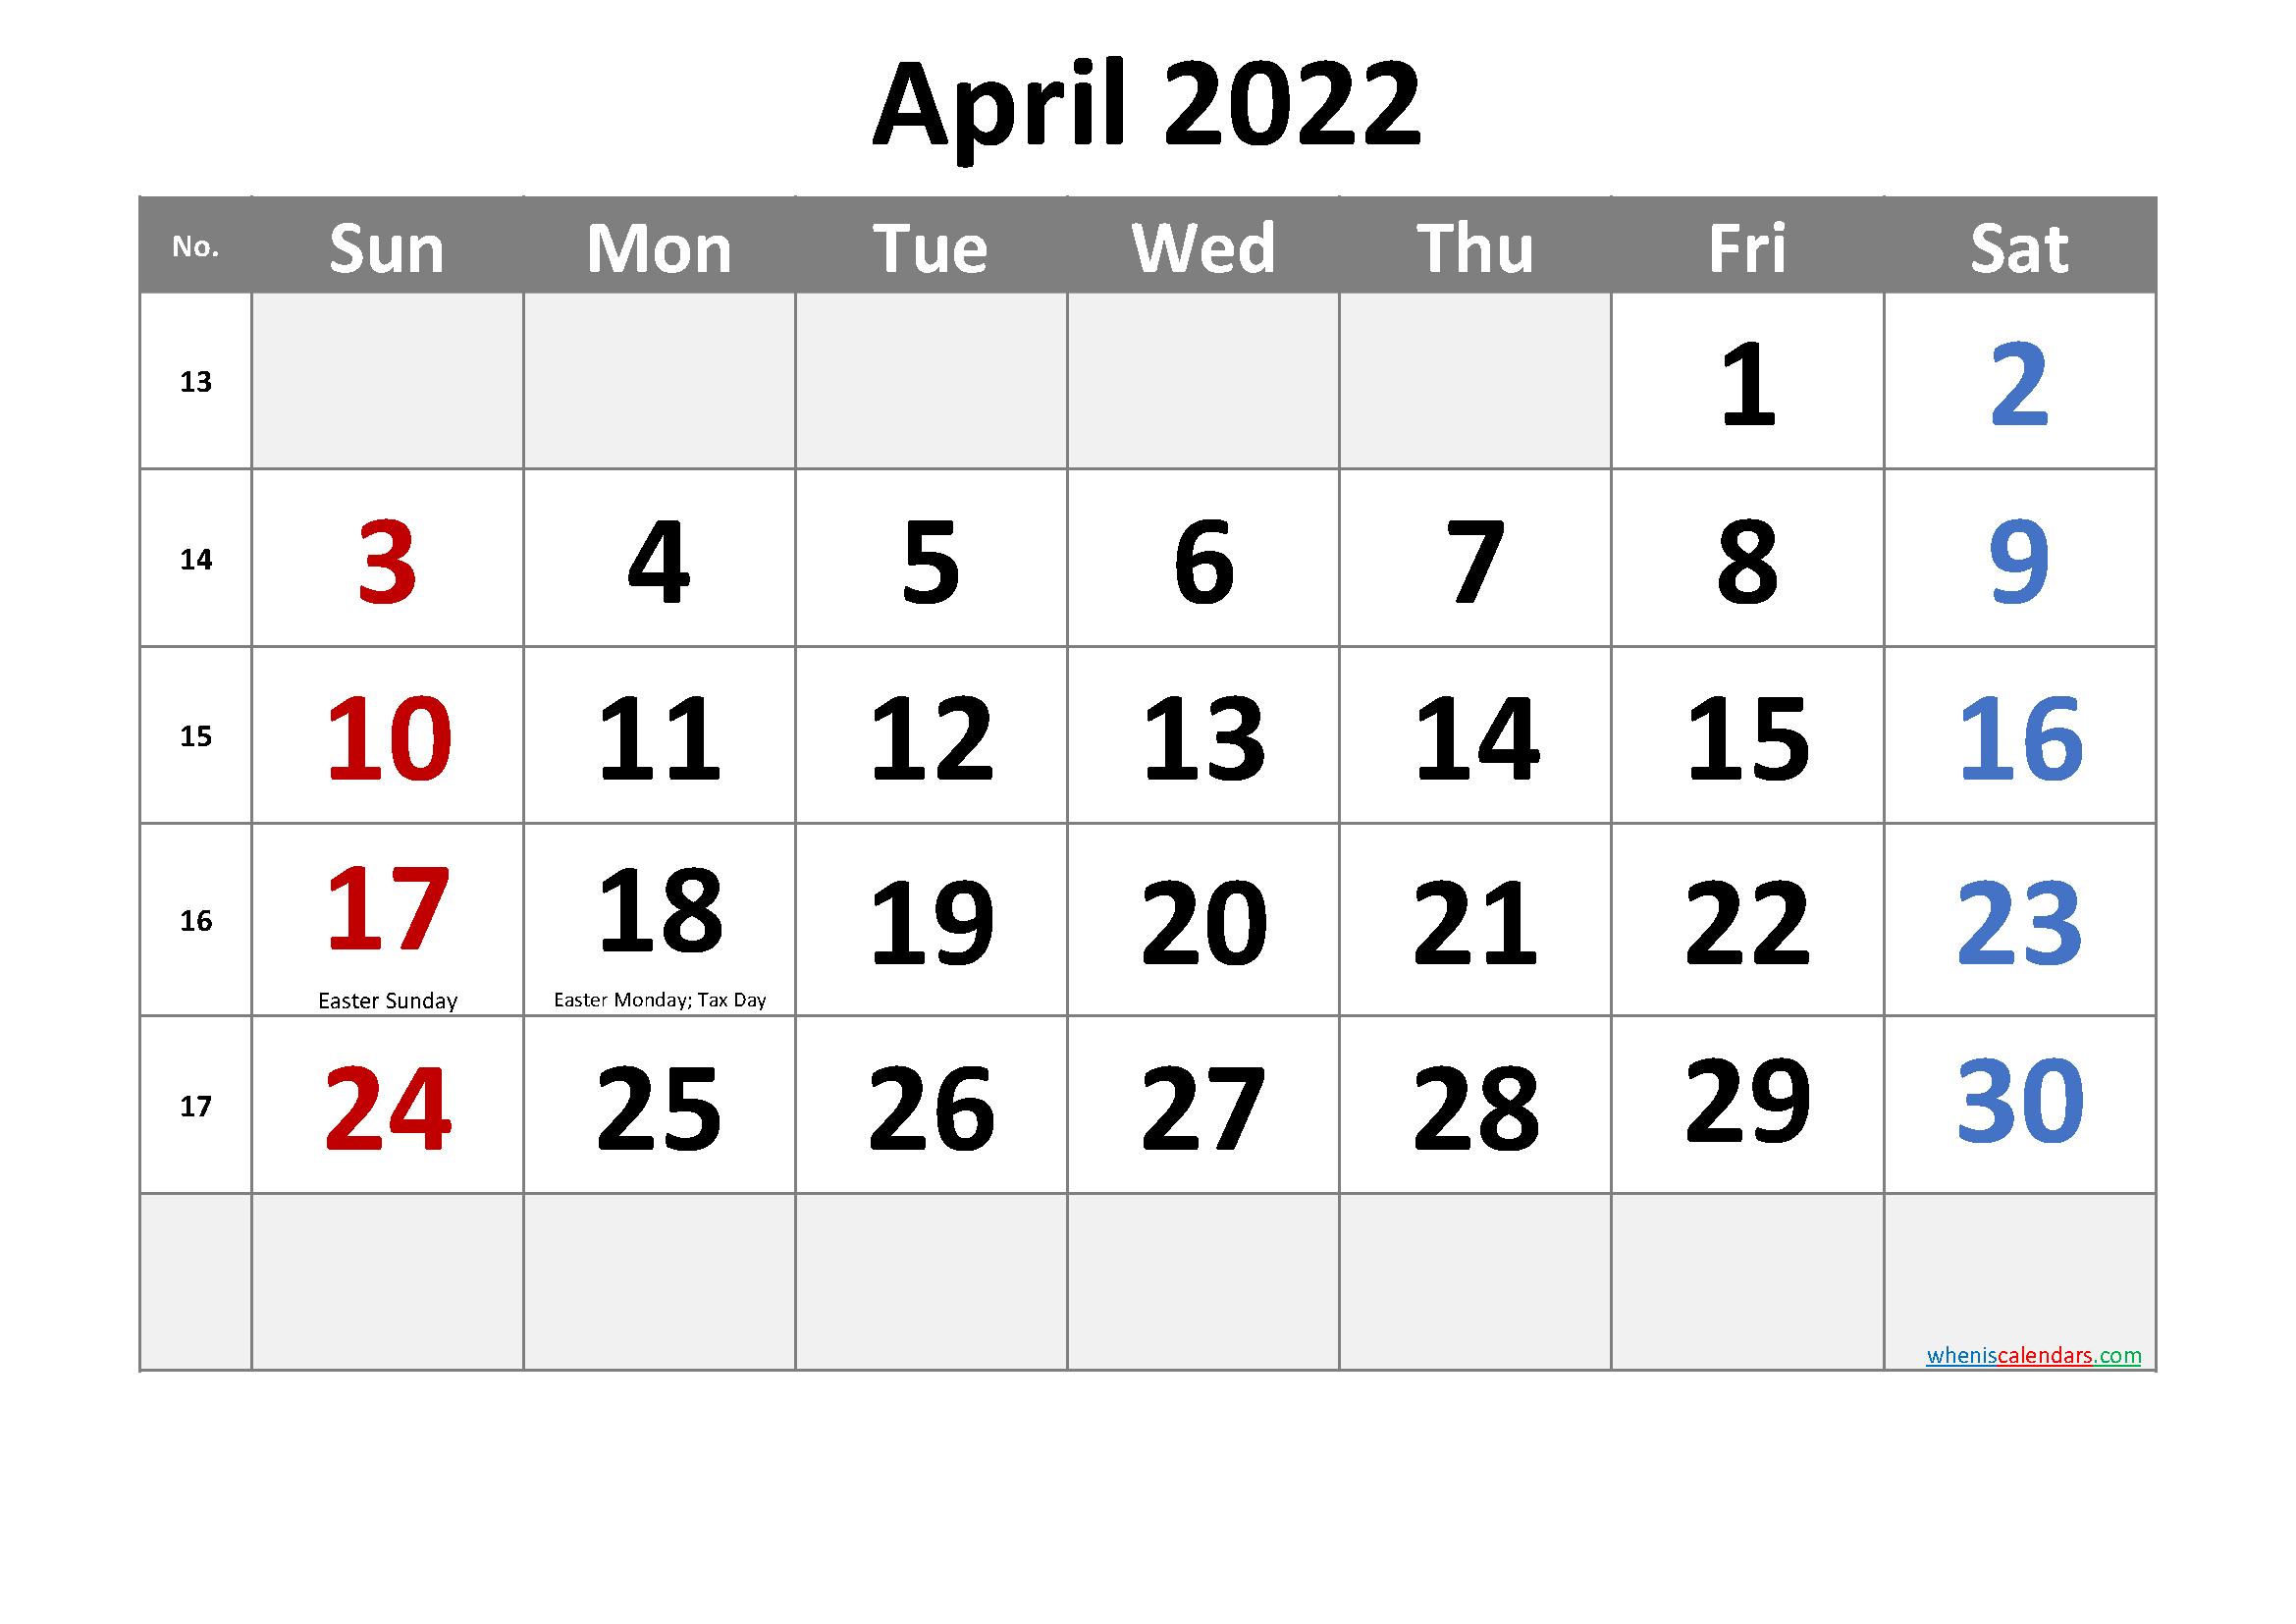 Free Printable April 2022 Calendar With Holidays throughout April 2022 Calendar Printable Images Photo